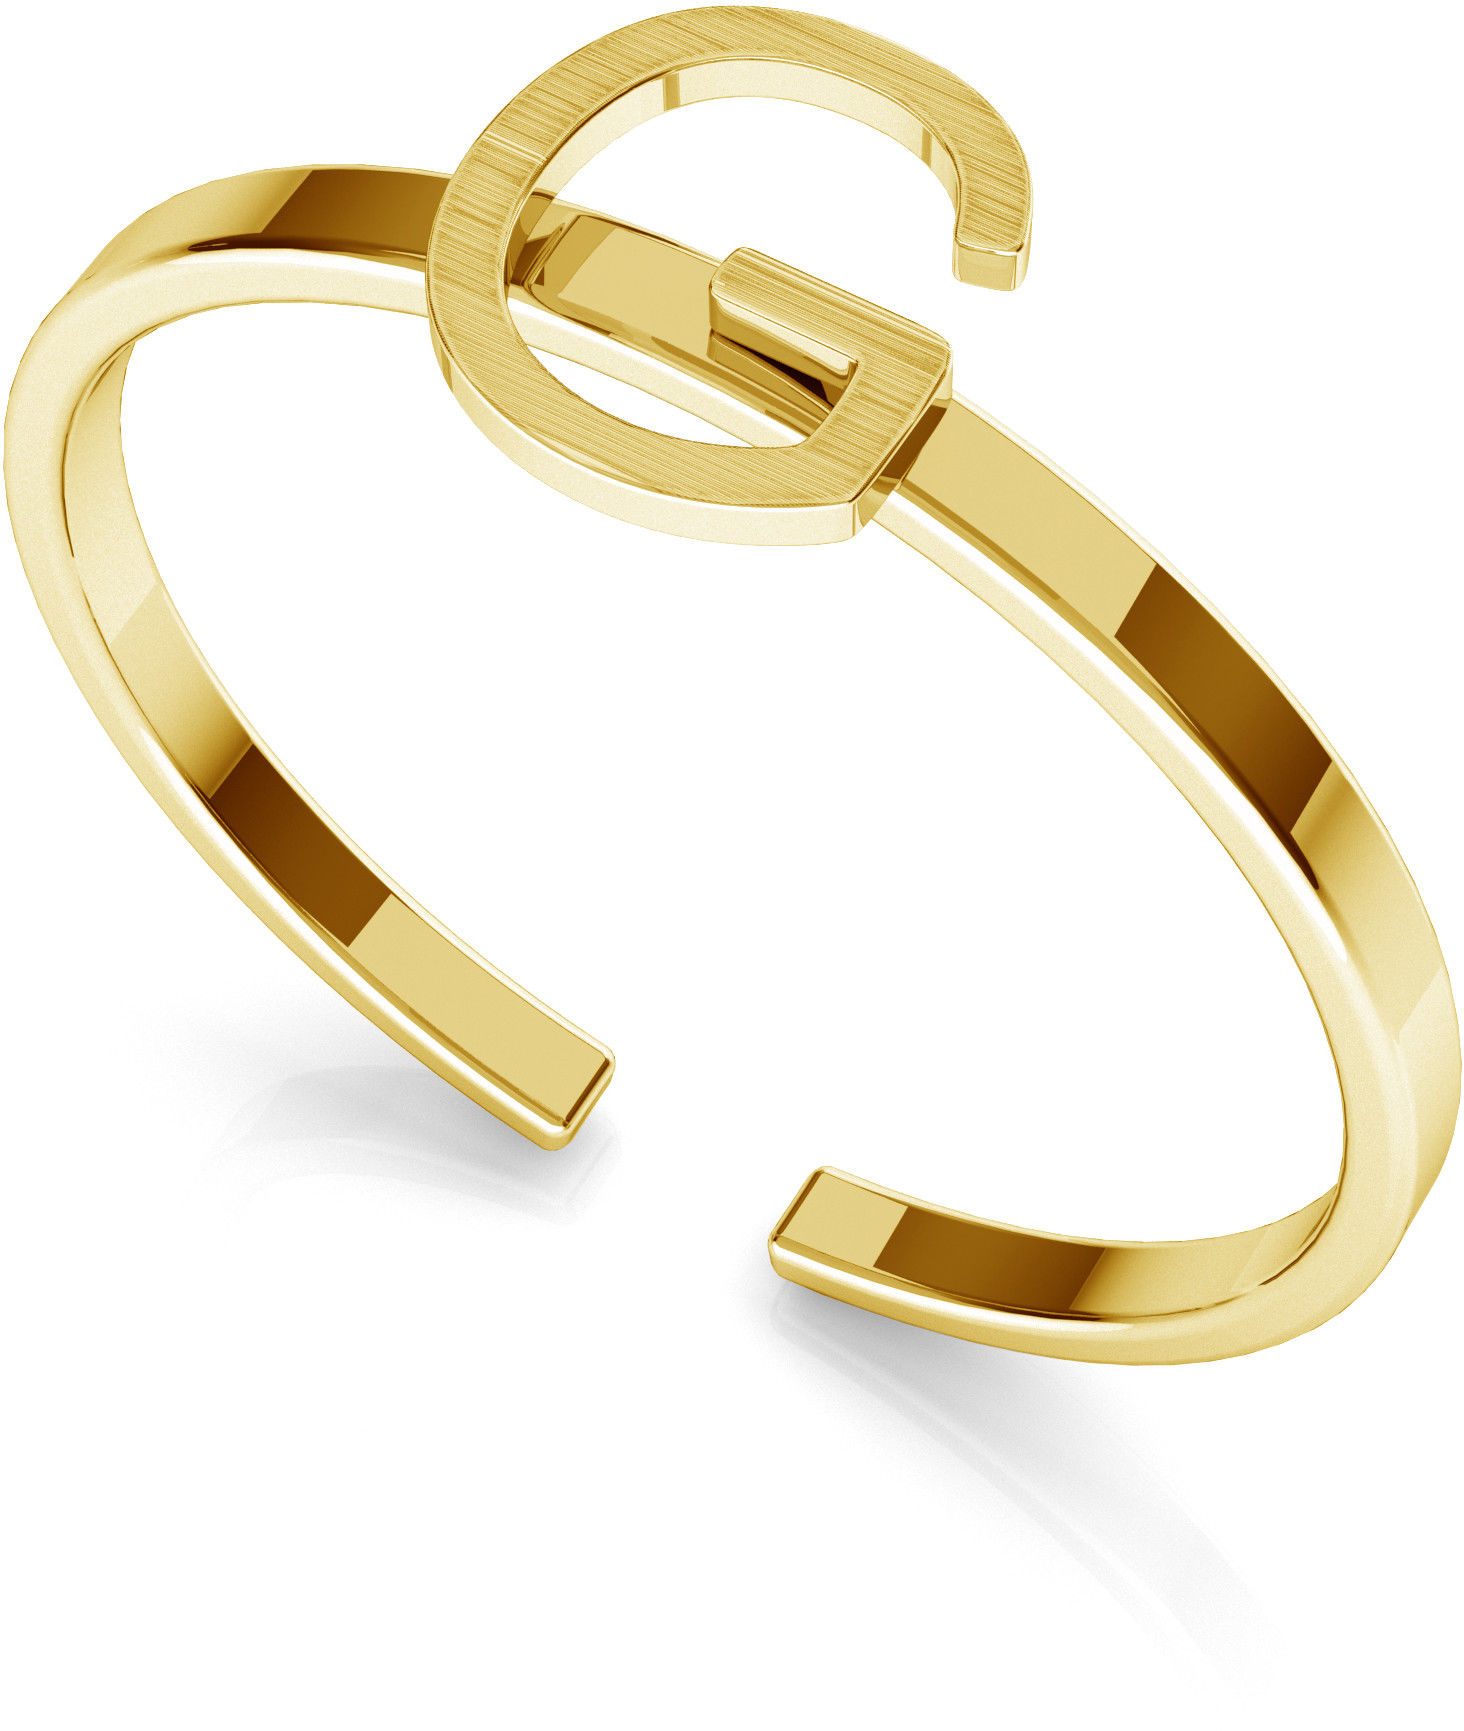 Srebrny pierścionek z literką My RING, srebro 925 : Litera - G, Srebro - kolor pokrycia - Pokrycie żółtym 18K złotem